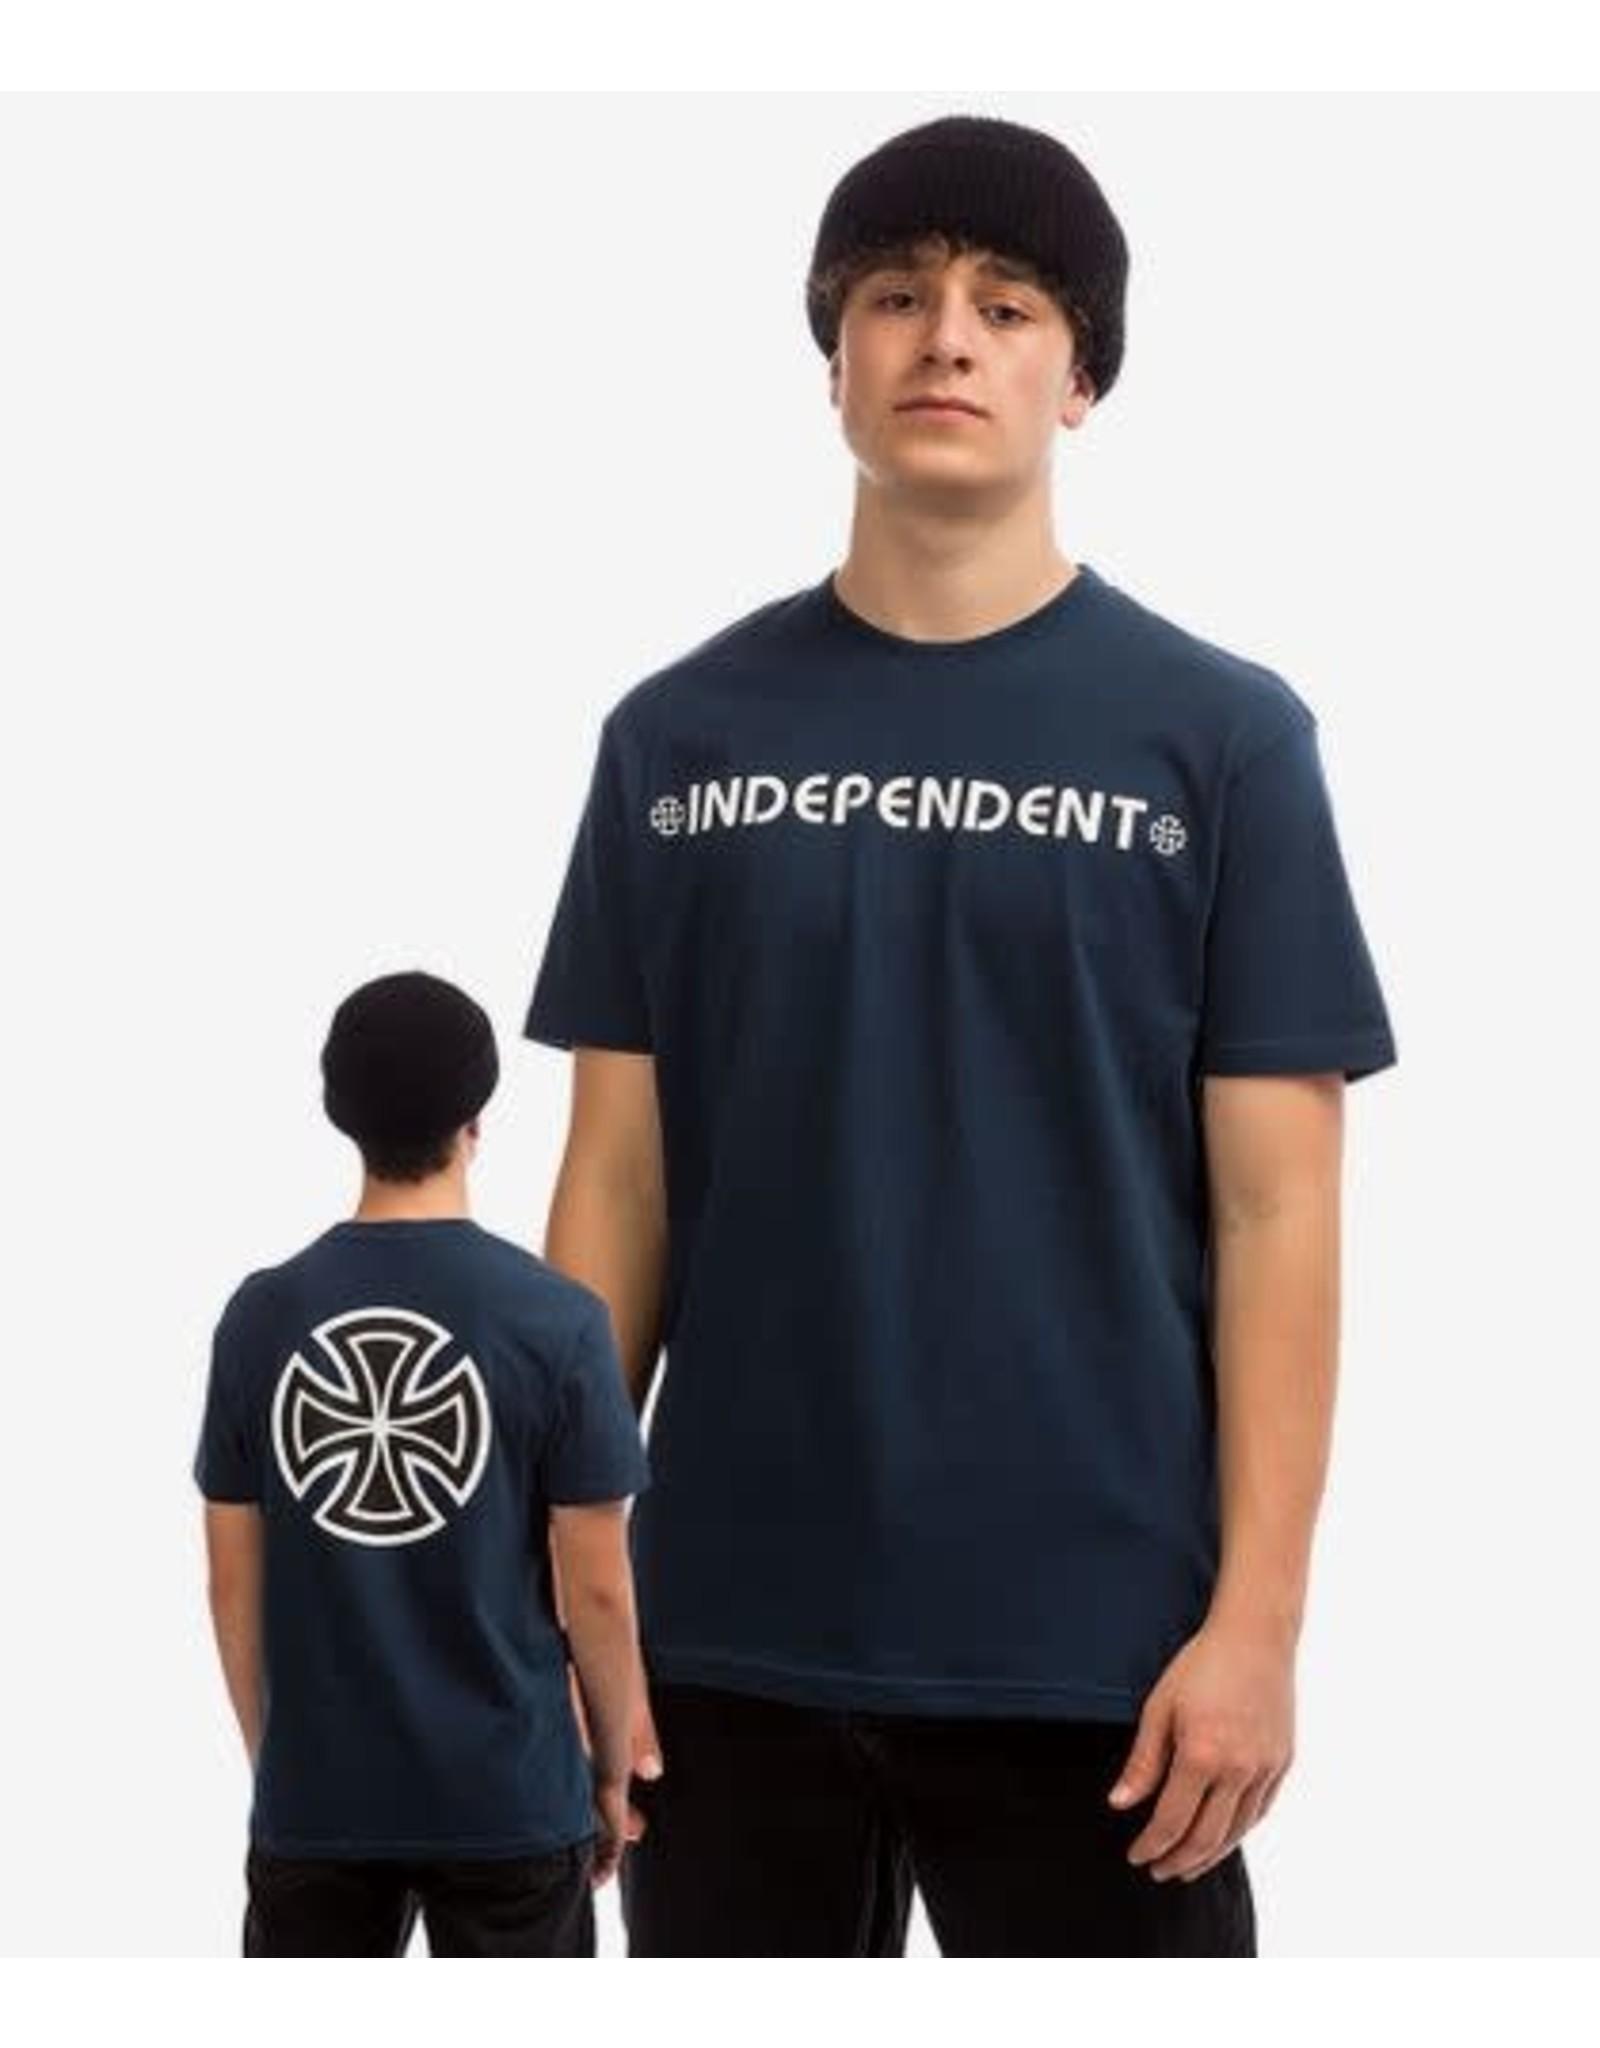 Independent Bar Cross S/S Tee - Navy